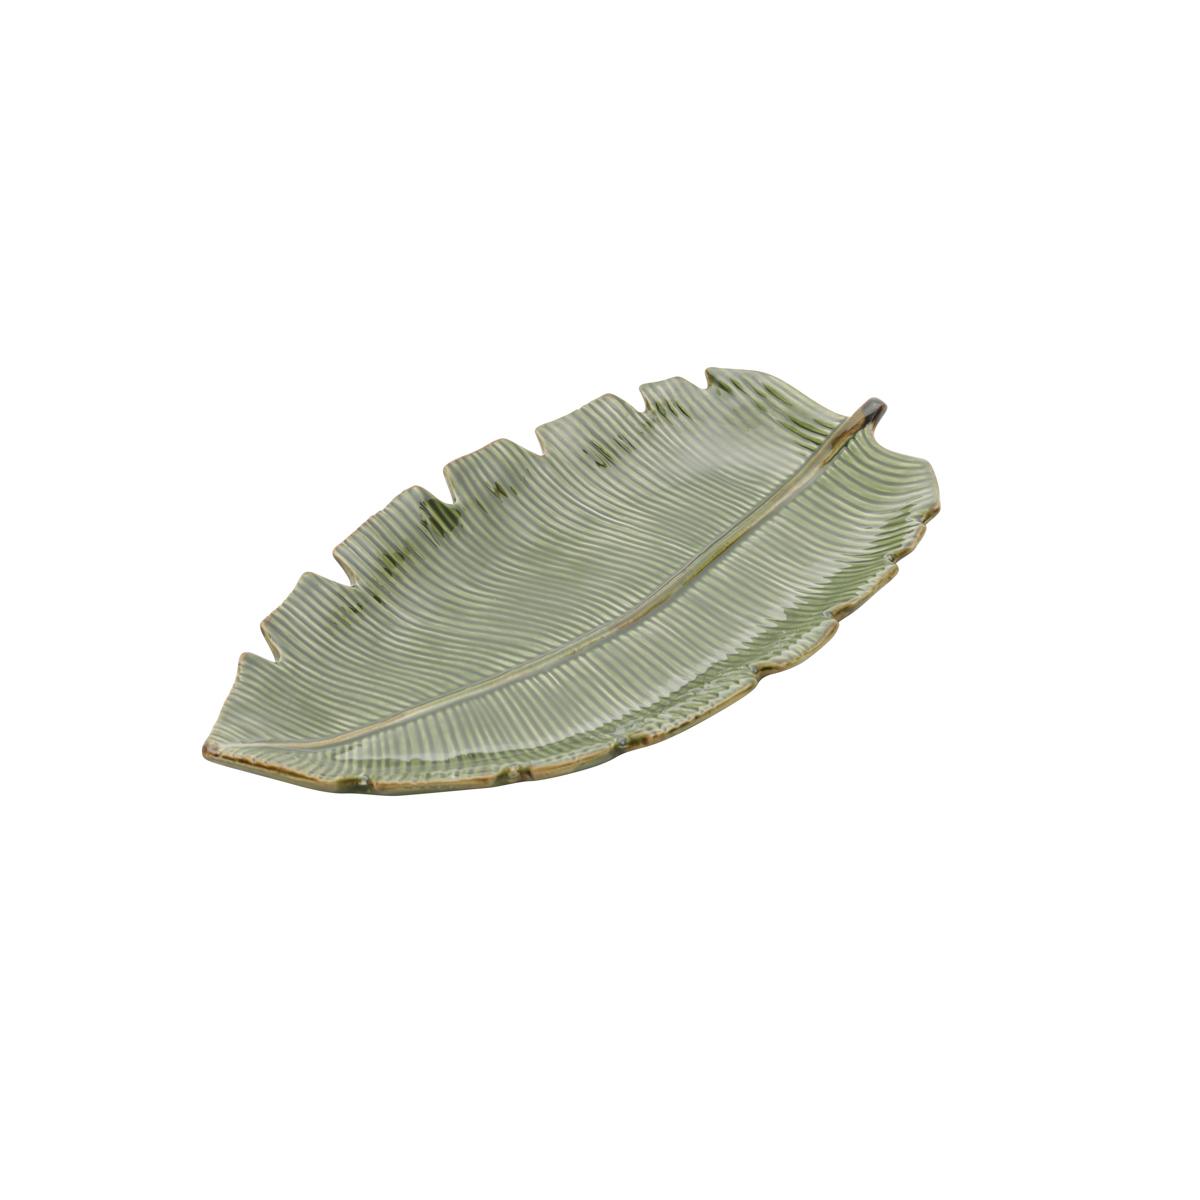 Folha decorativa cerâmica Banana Leaf verde 29x3x16cm Lyor